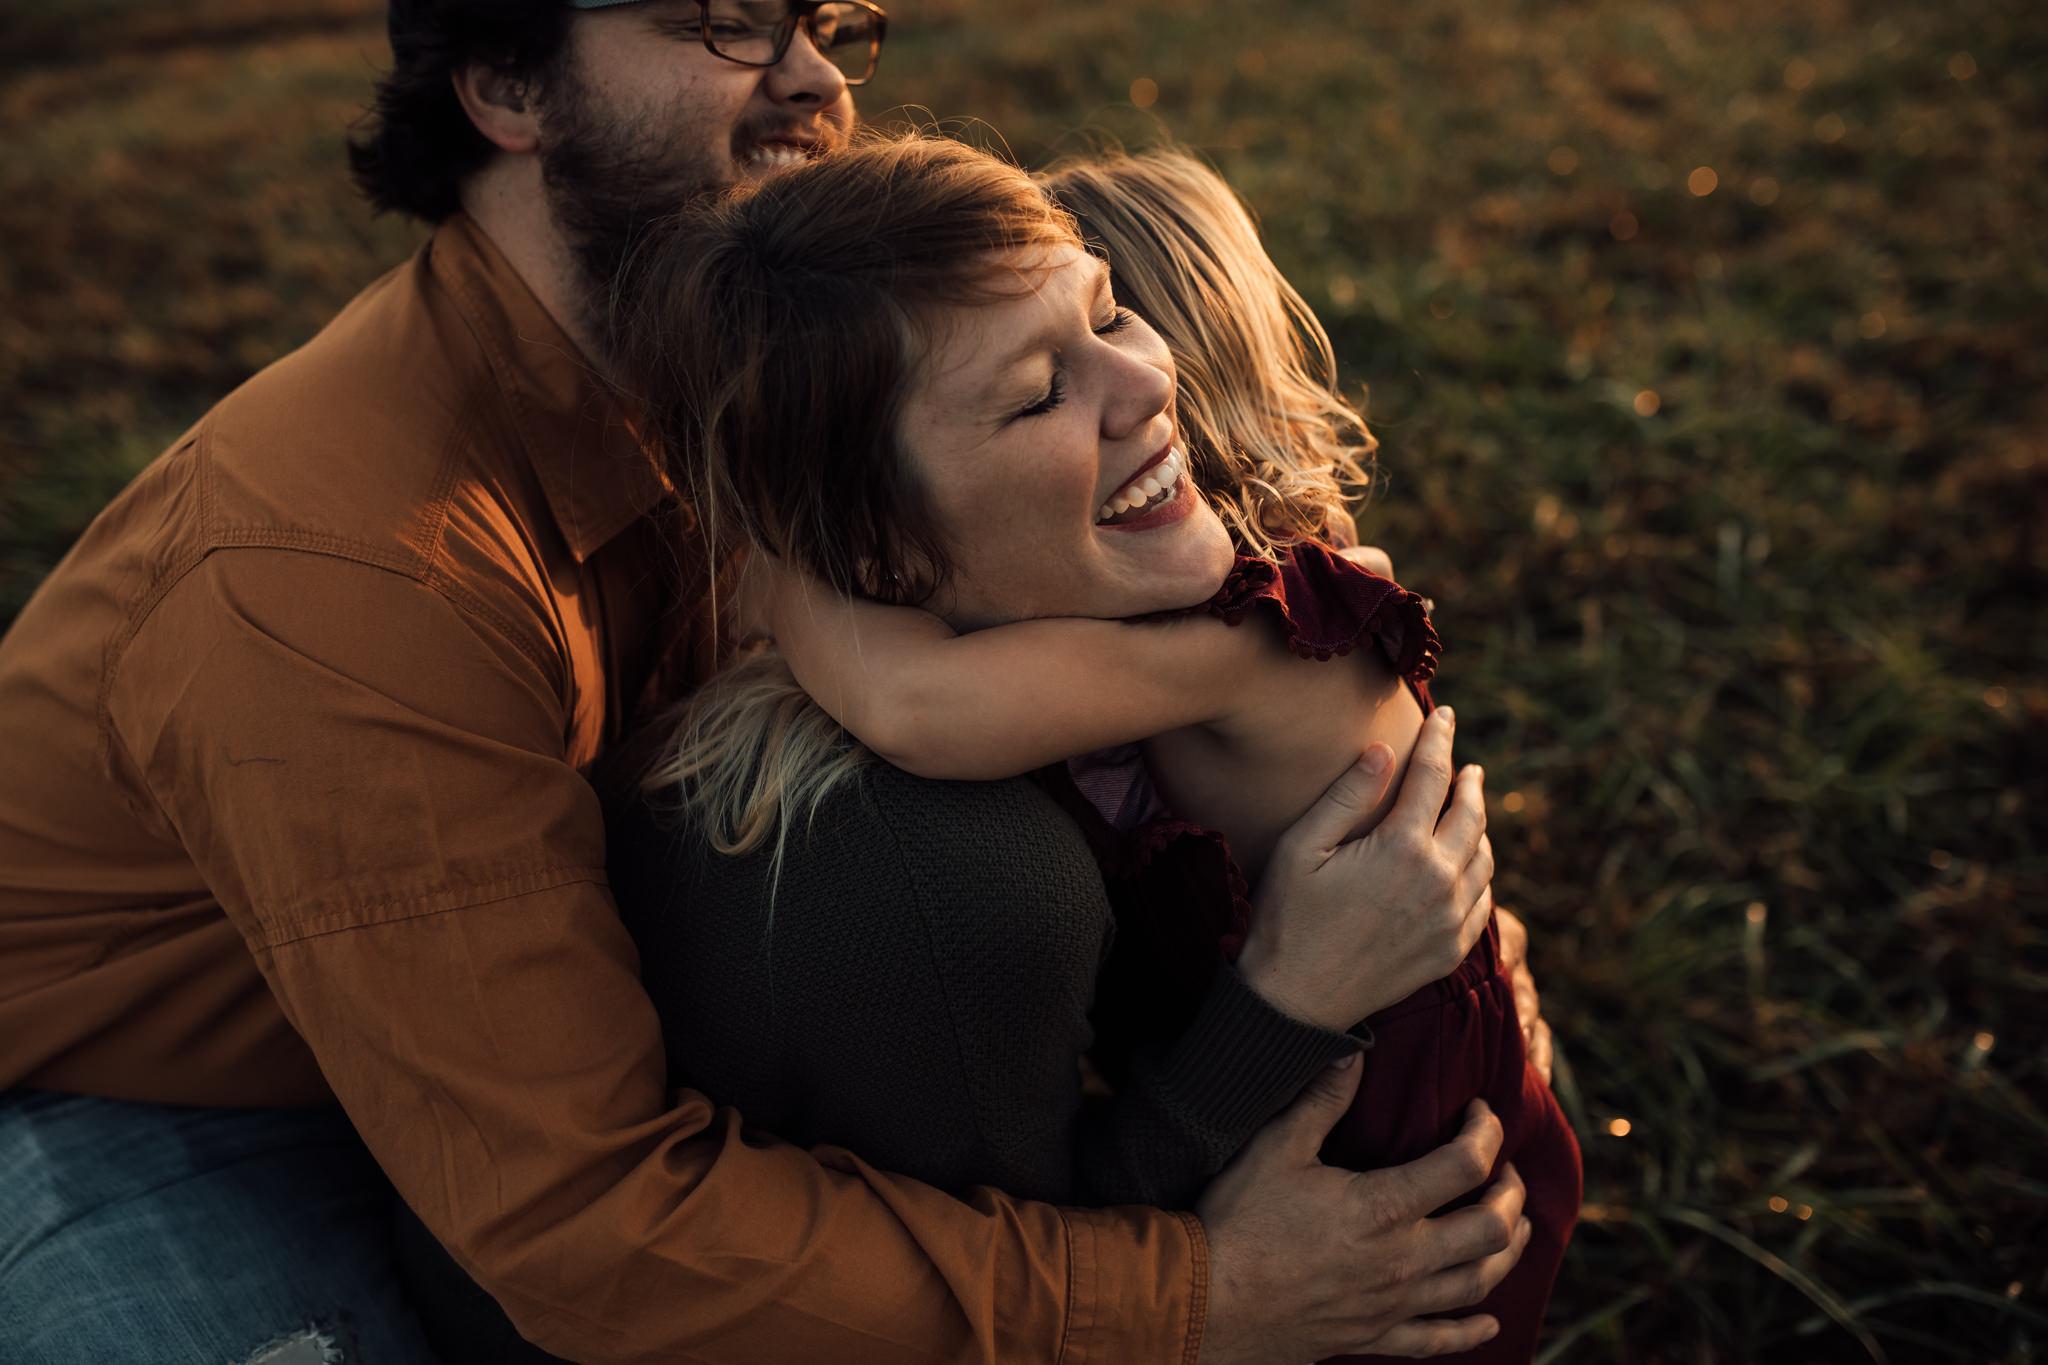 cassie-cook-photography-memphis-family-photographer-lifestyle-family-photographer-sunrise-gray-family-17.jpg